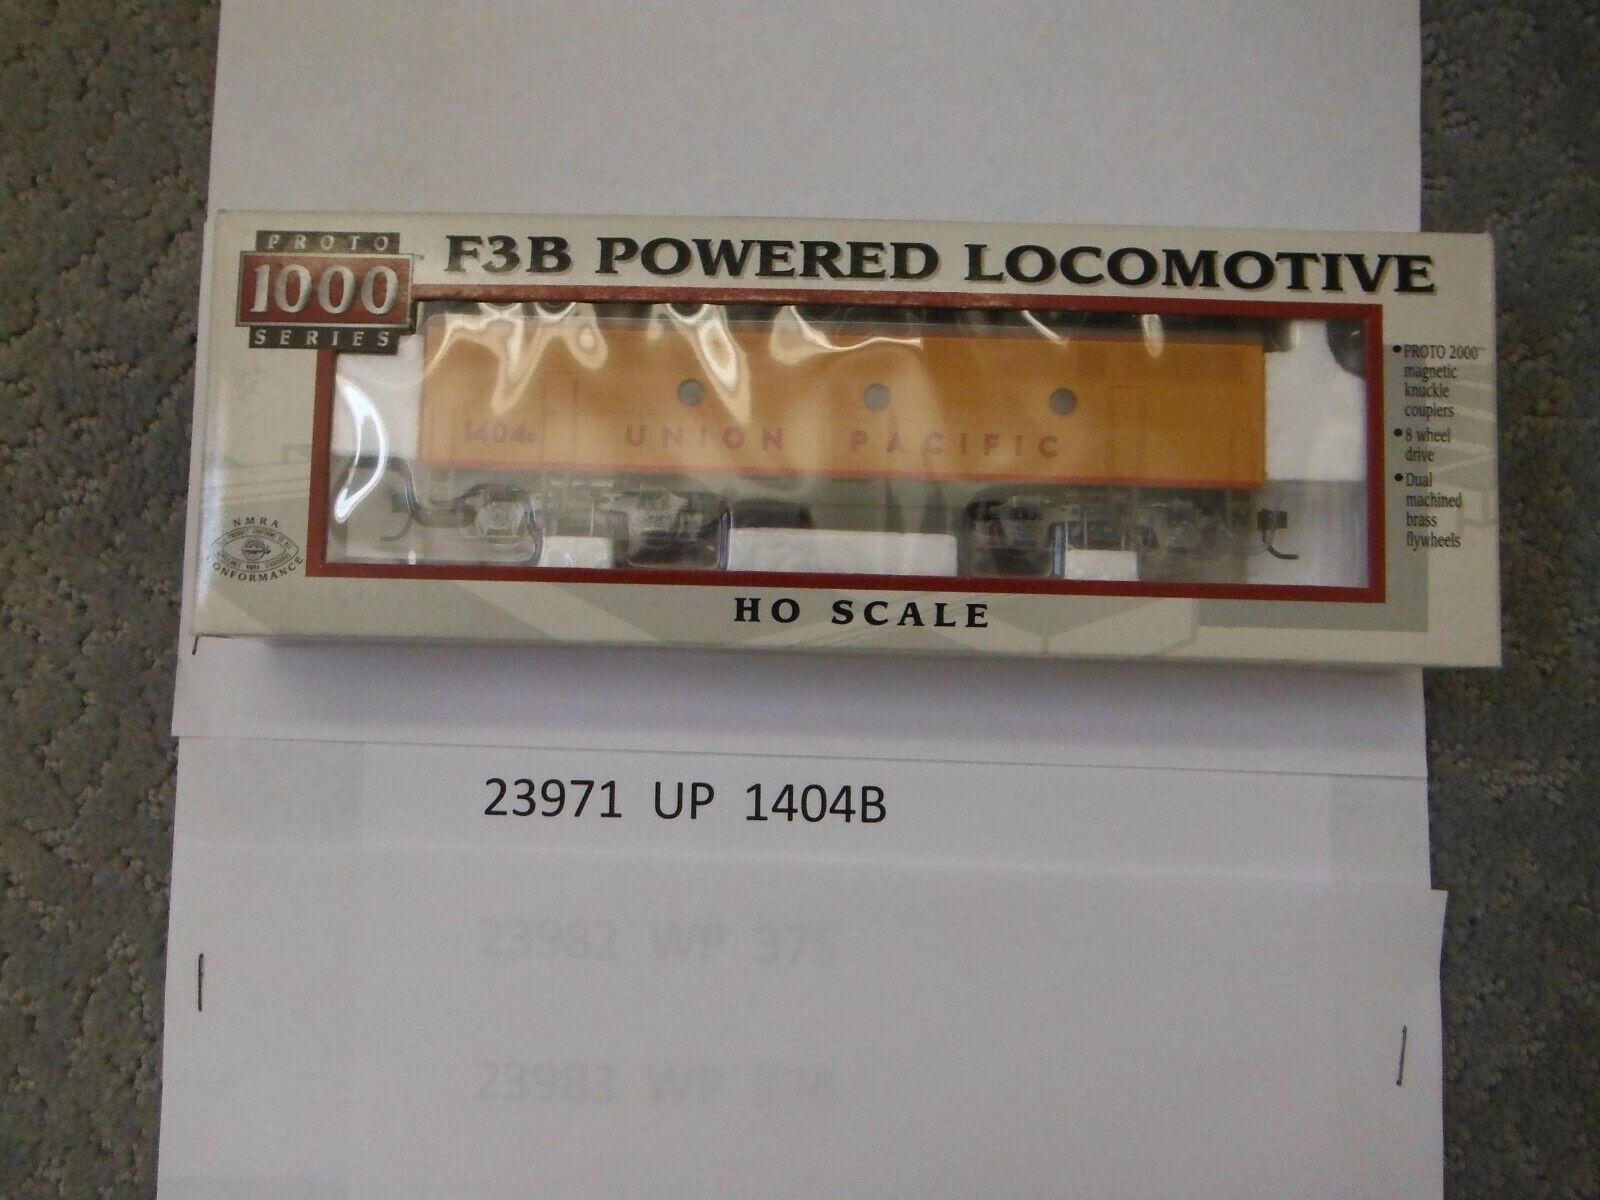 23971 UP 1404B Prossoo 1000 Series F3B energiaosso Locomotive